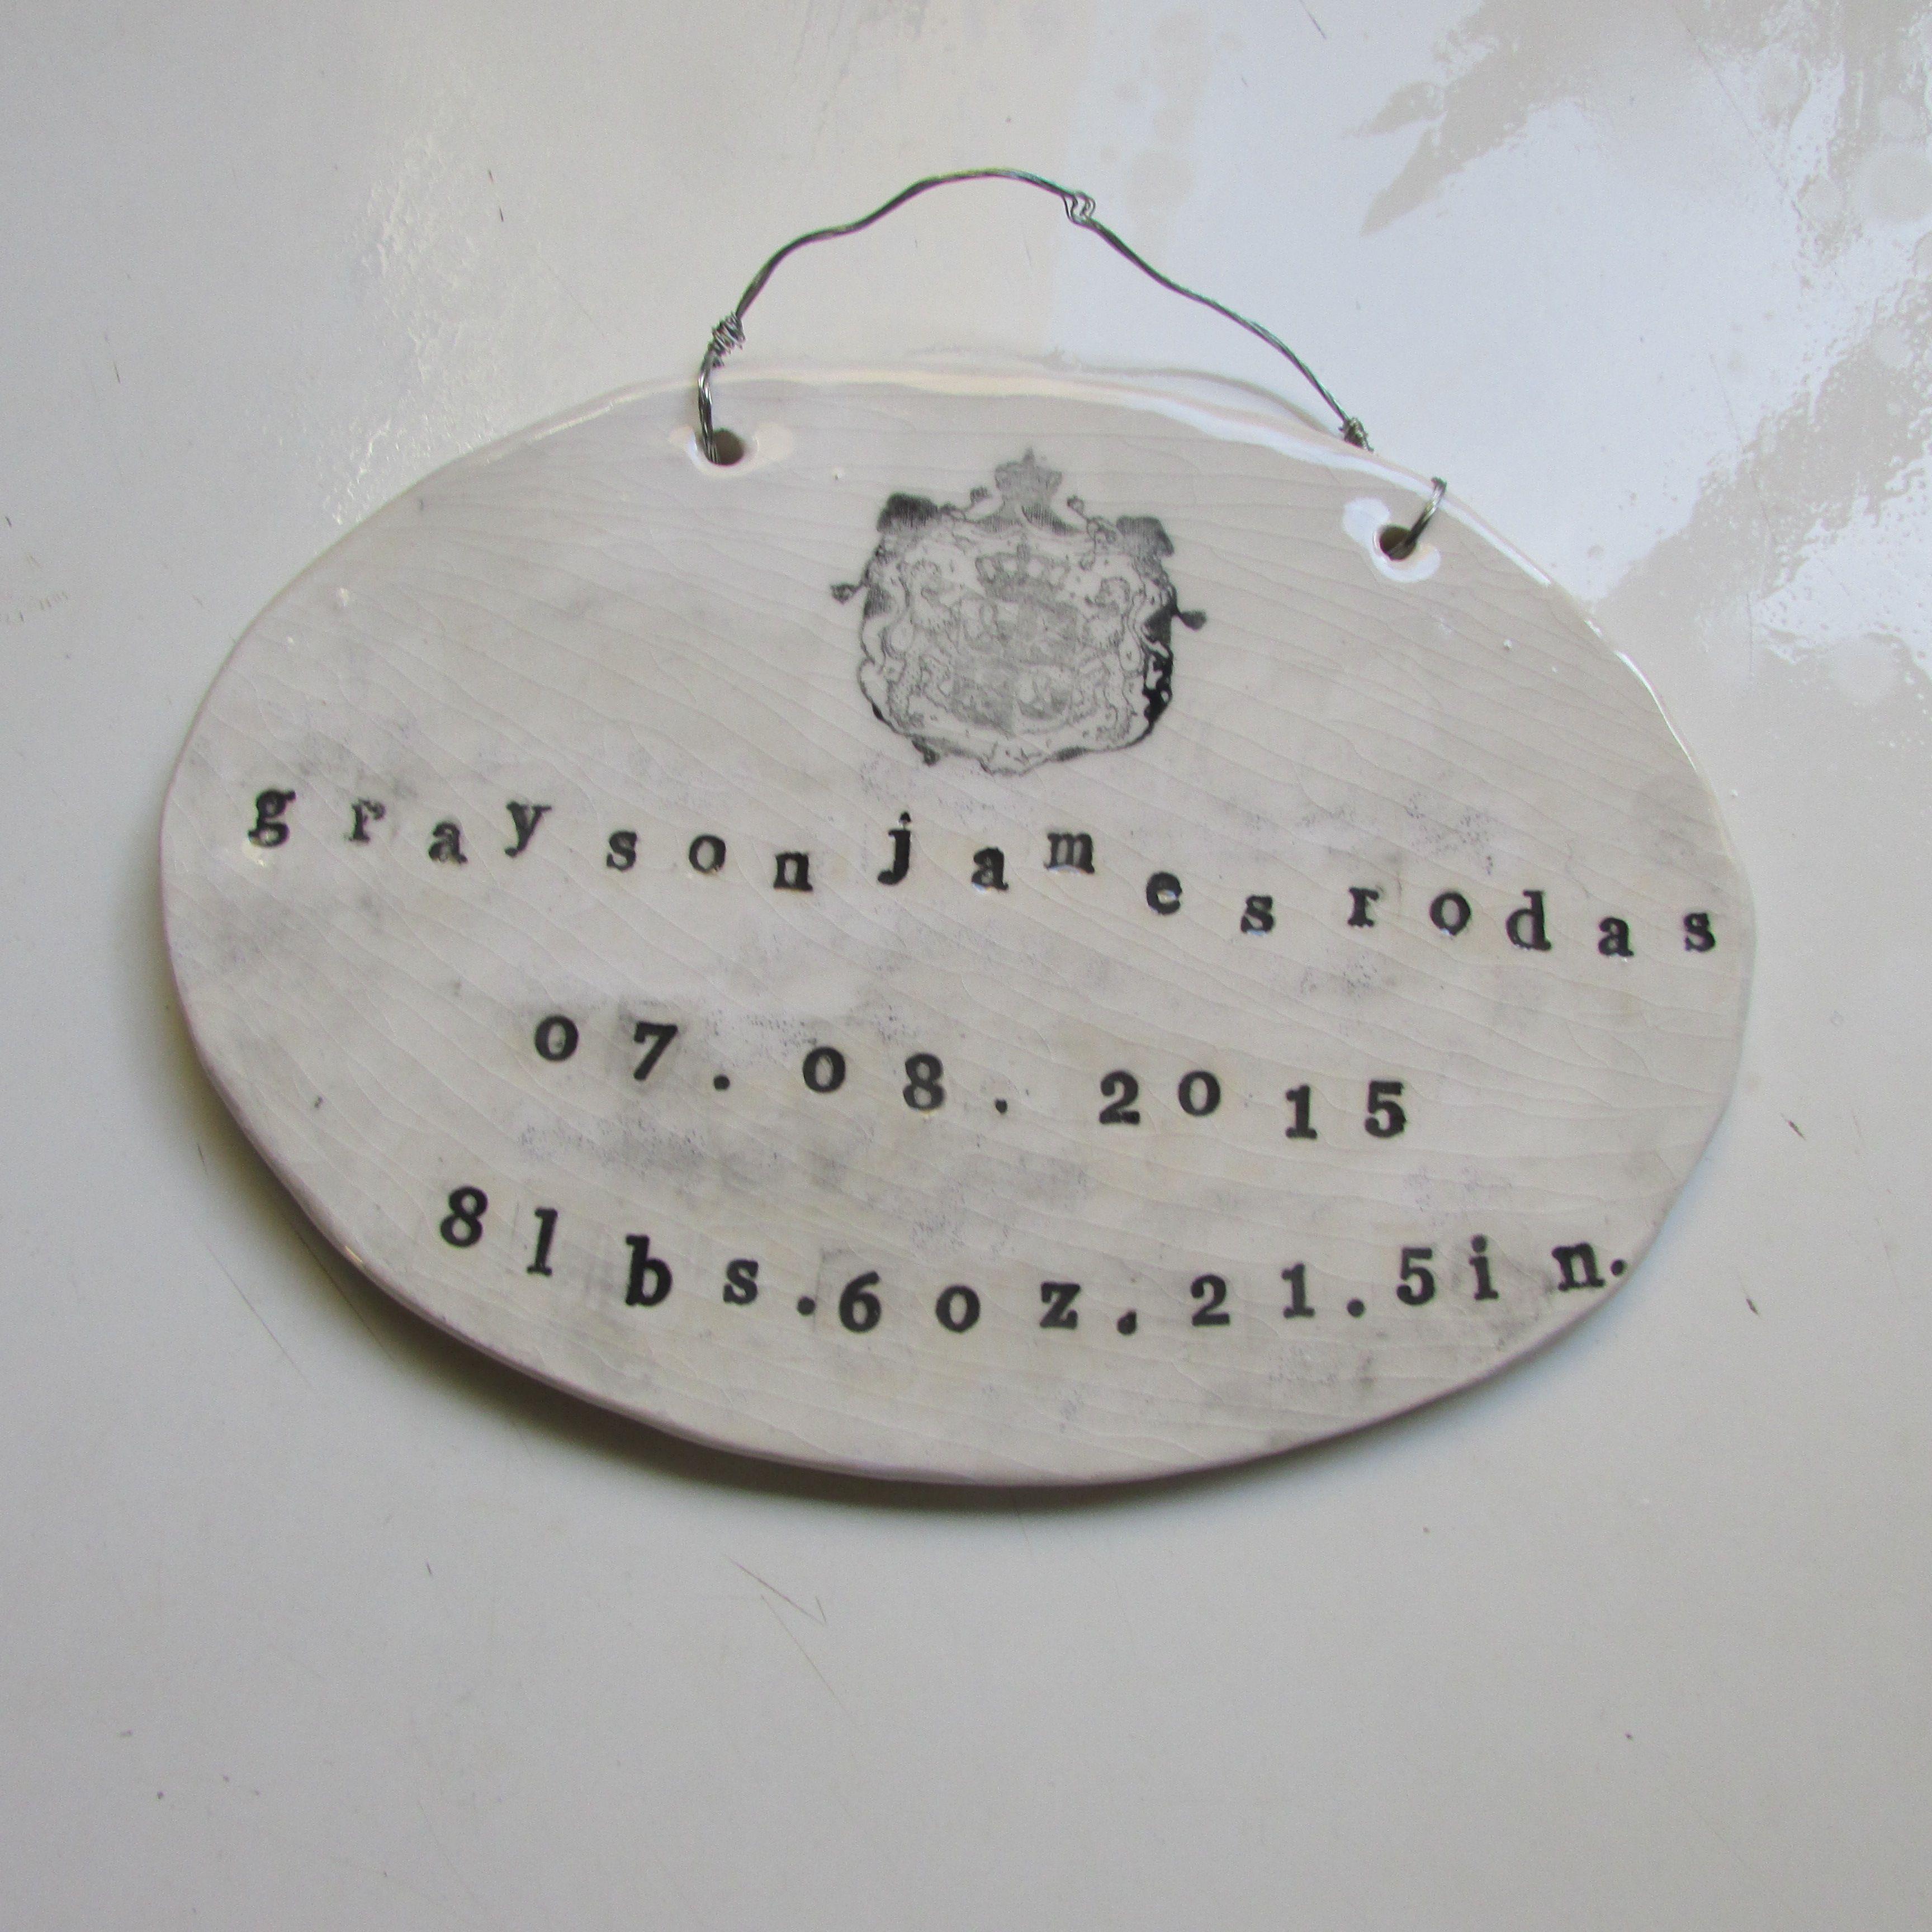 Birth certificate wall plaque for grayson james rodas